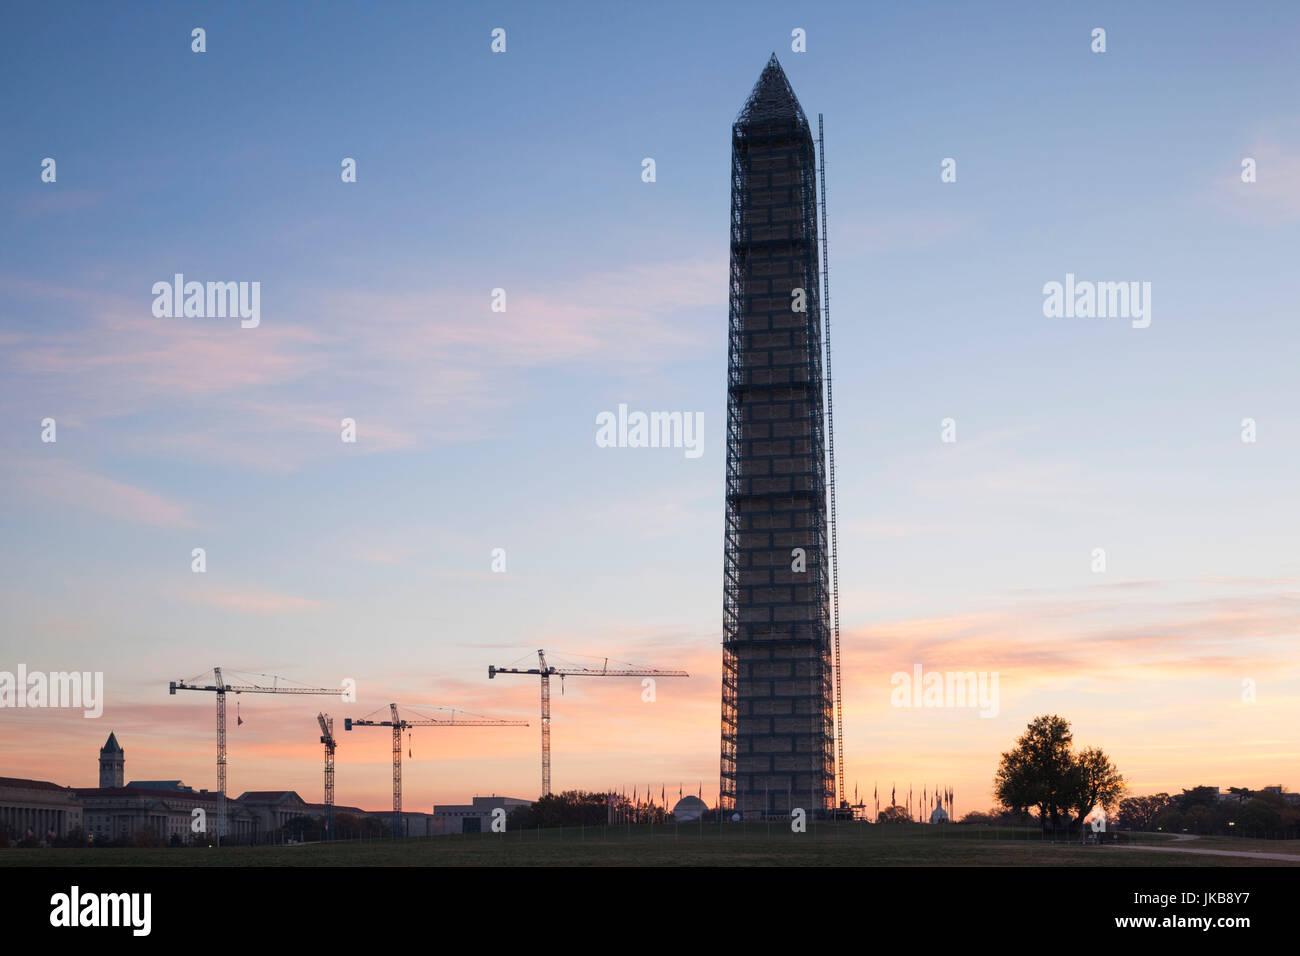 USA, Washington DC, Washington Monument, dawn - Stock Image